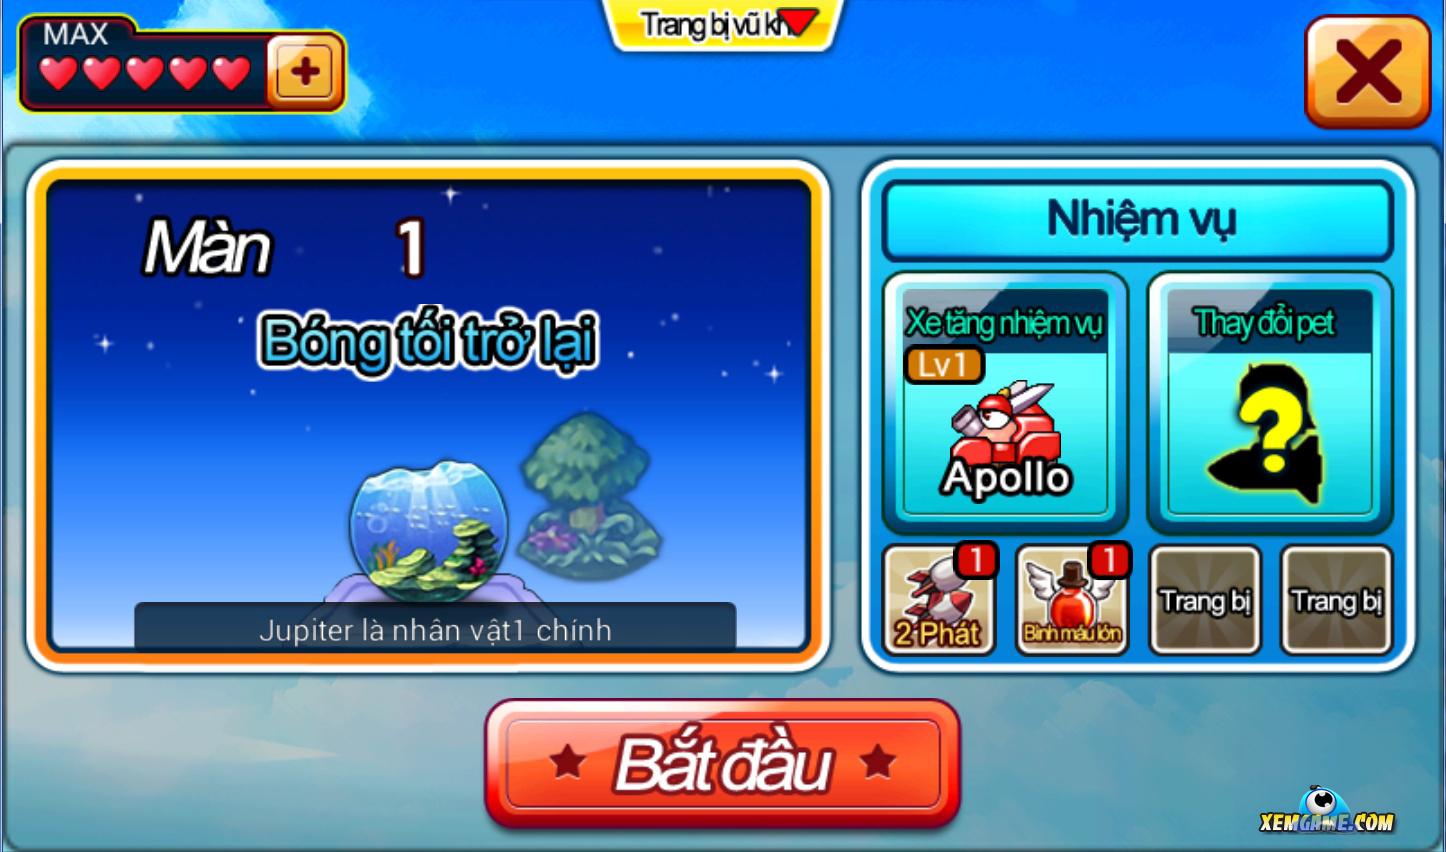 game-oppa_-tank-mobile-7.jpg (1446×852)